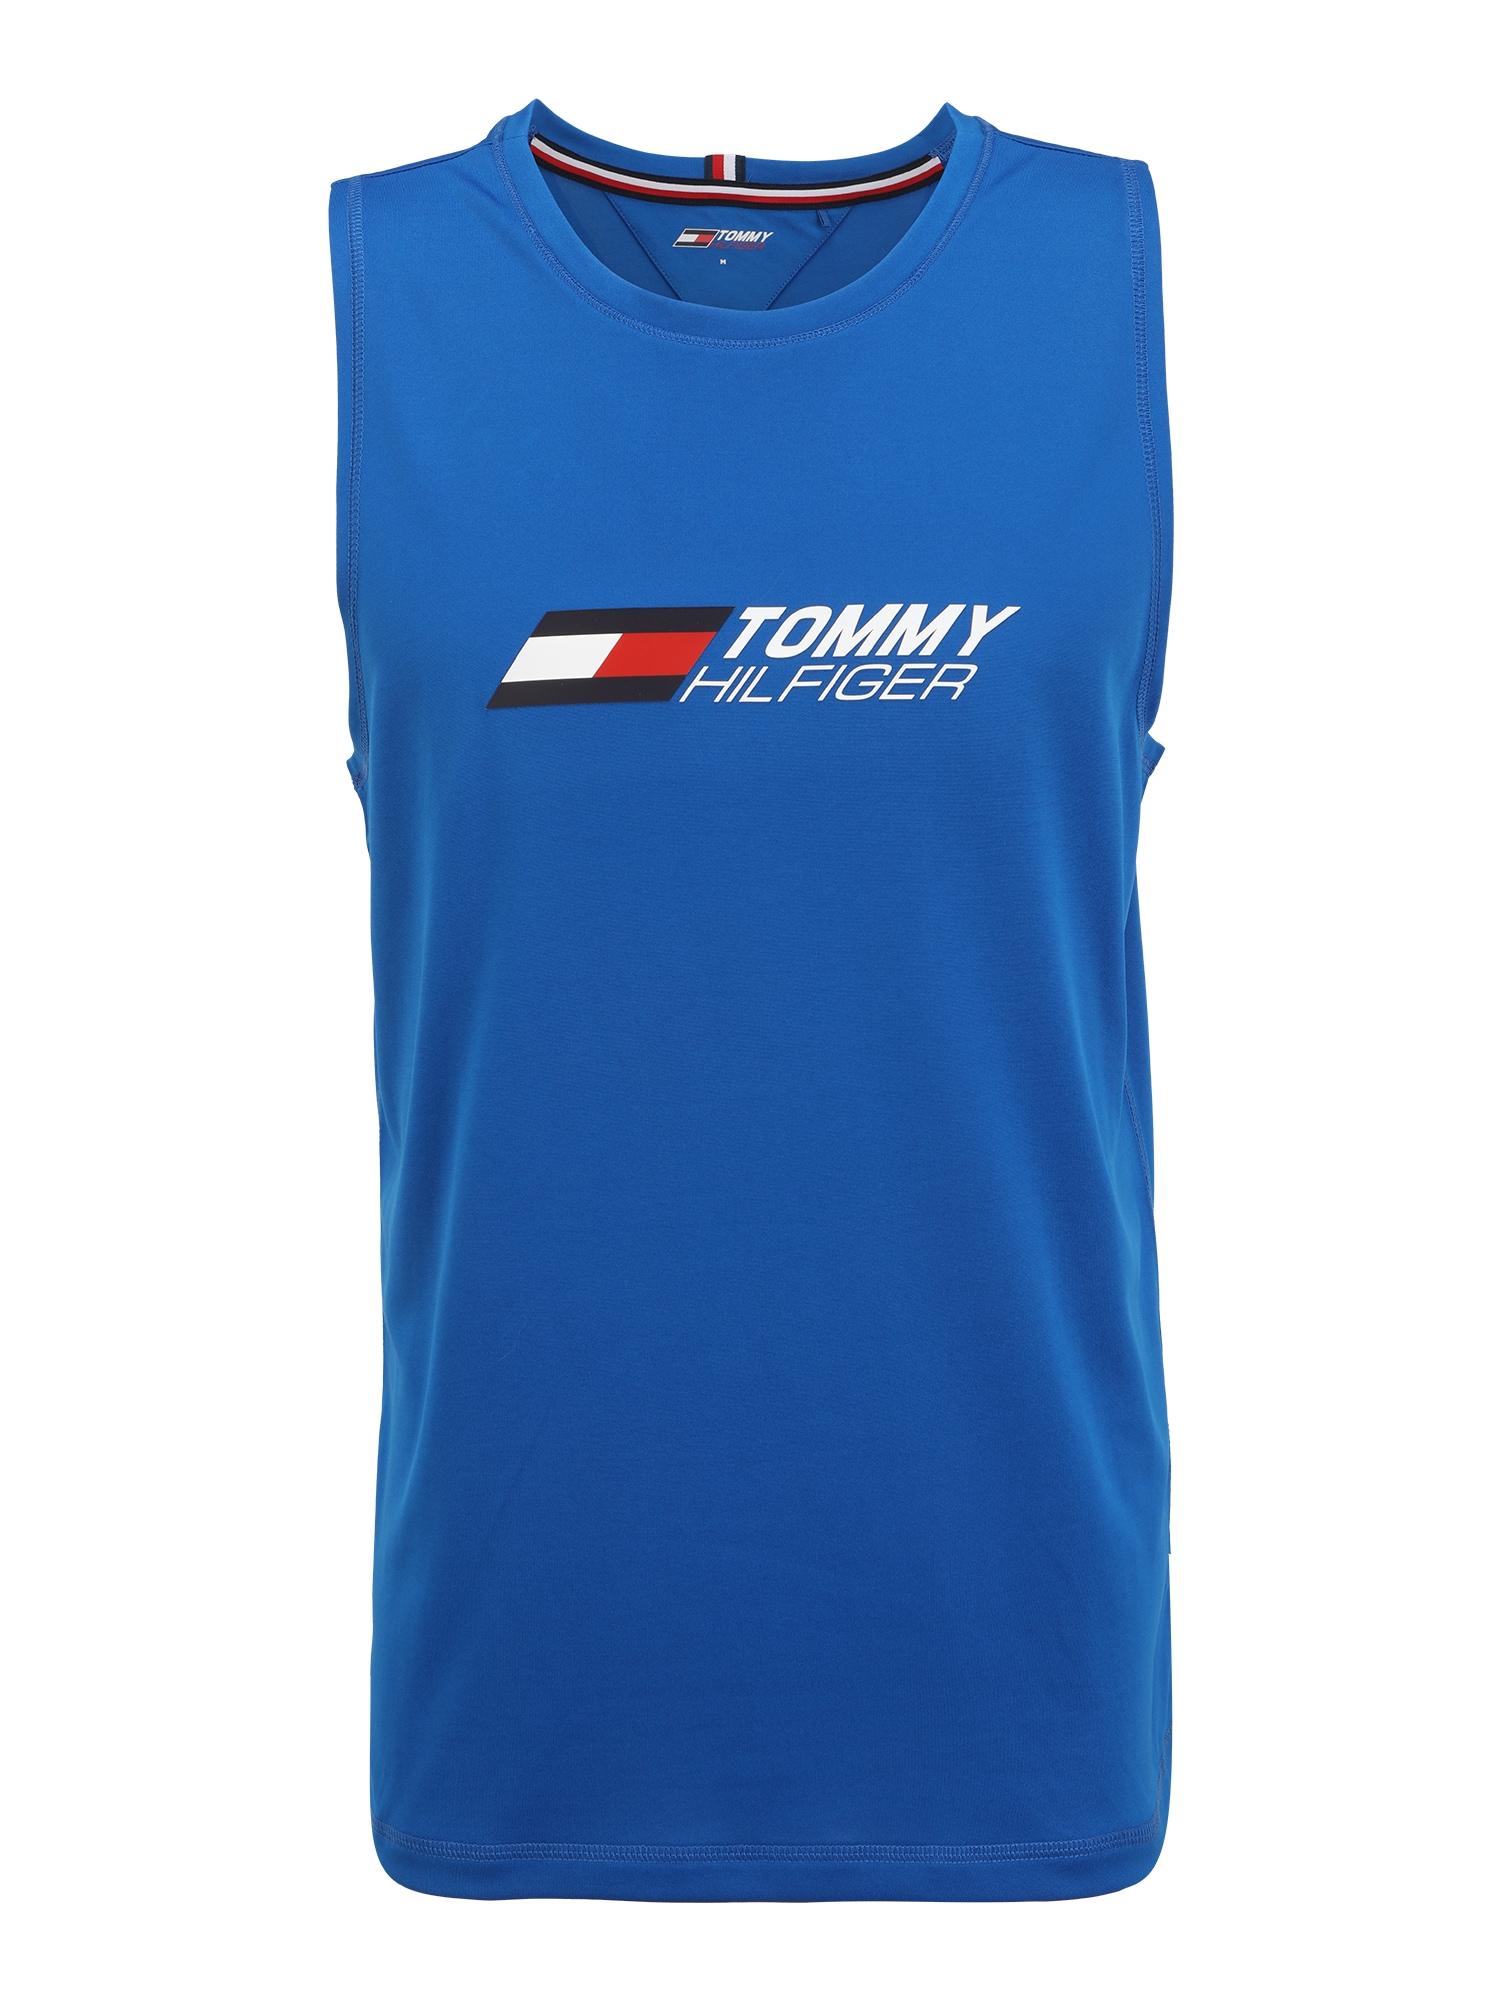 "Tommy Sport Sportiniai marškinėliai sodri mėlyna (""karališka"") / balta / raudona / nakties mėlyna"